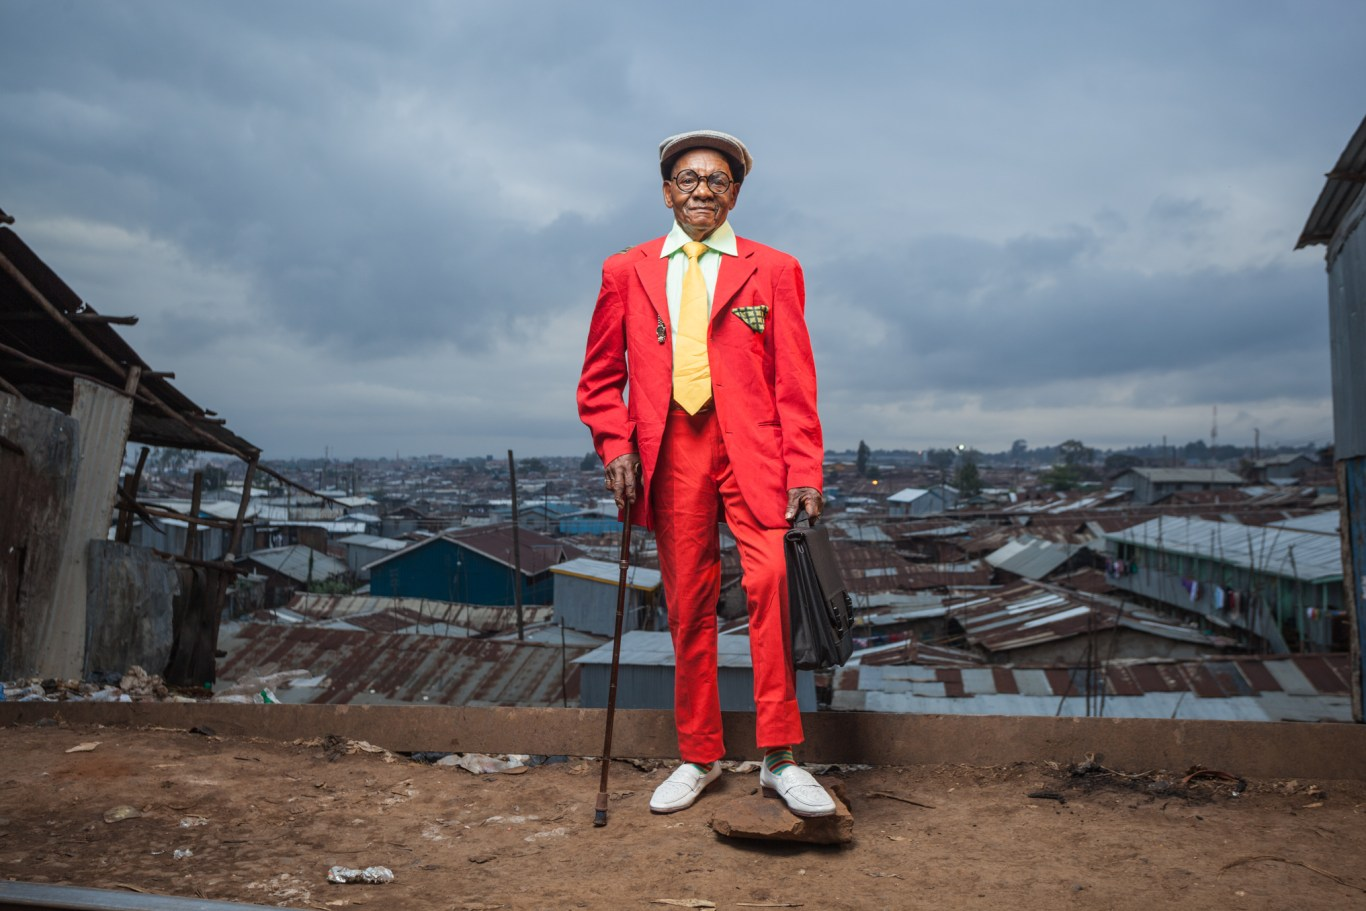 Kenyan Sapeur of Kibera. Shot by Osborne Macharia, Capture Kenya 2014